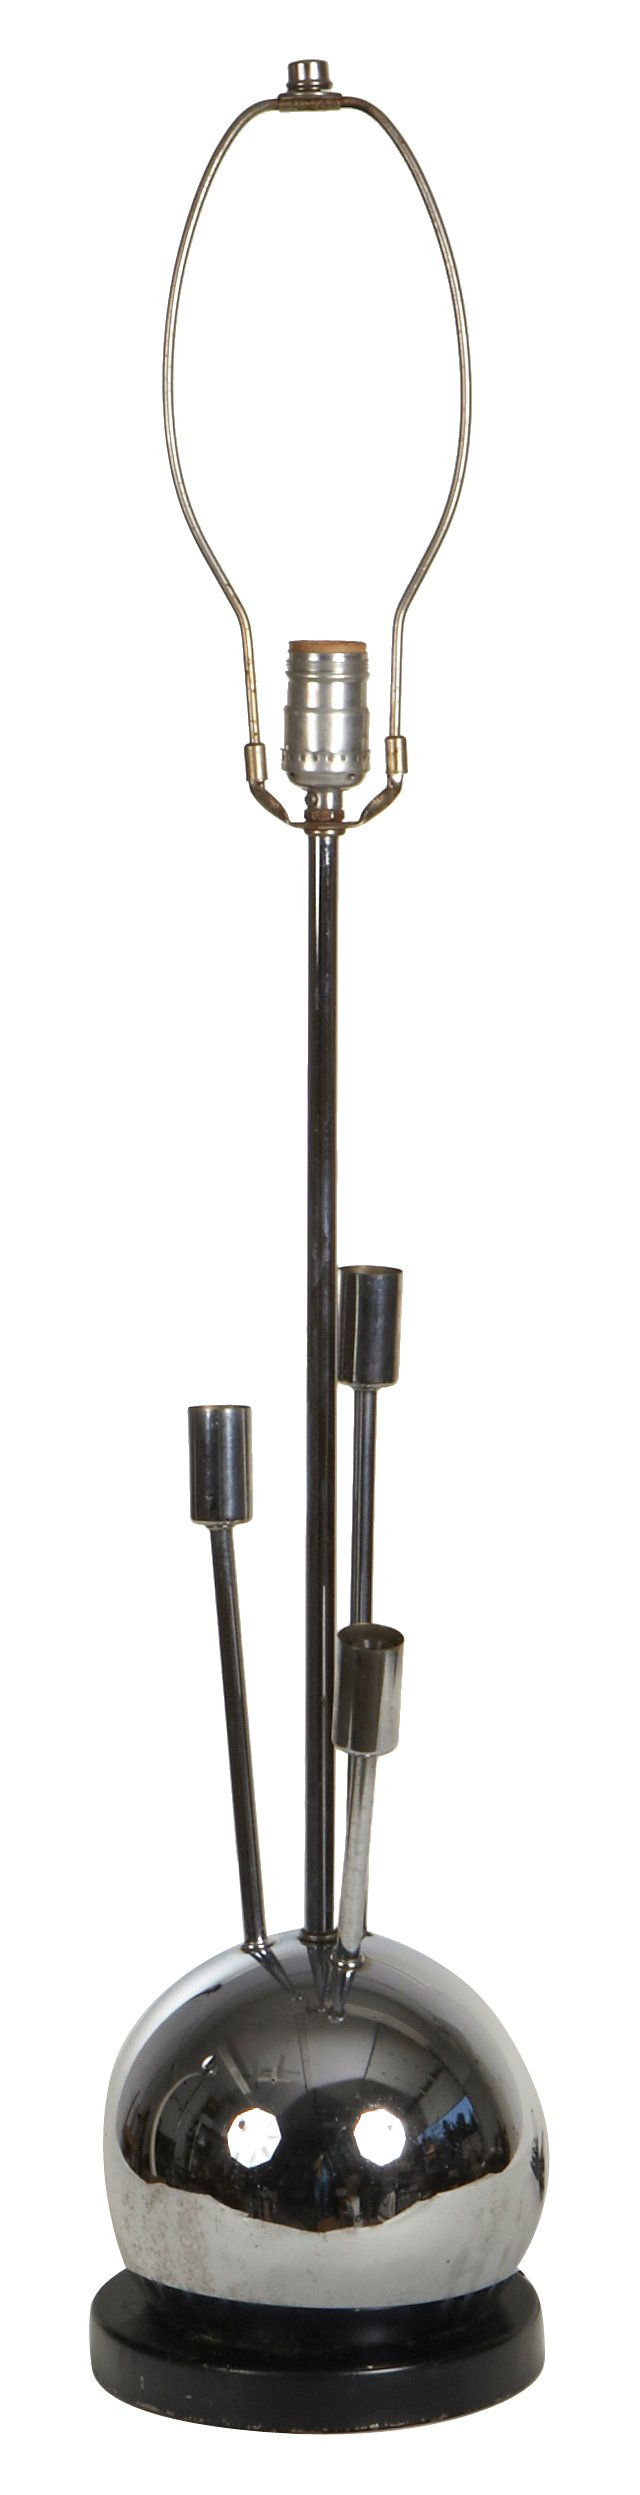 Mid-Century Modern Chrome Lamp